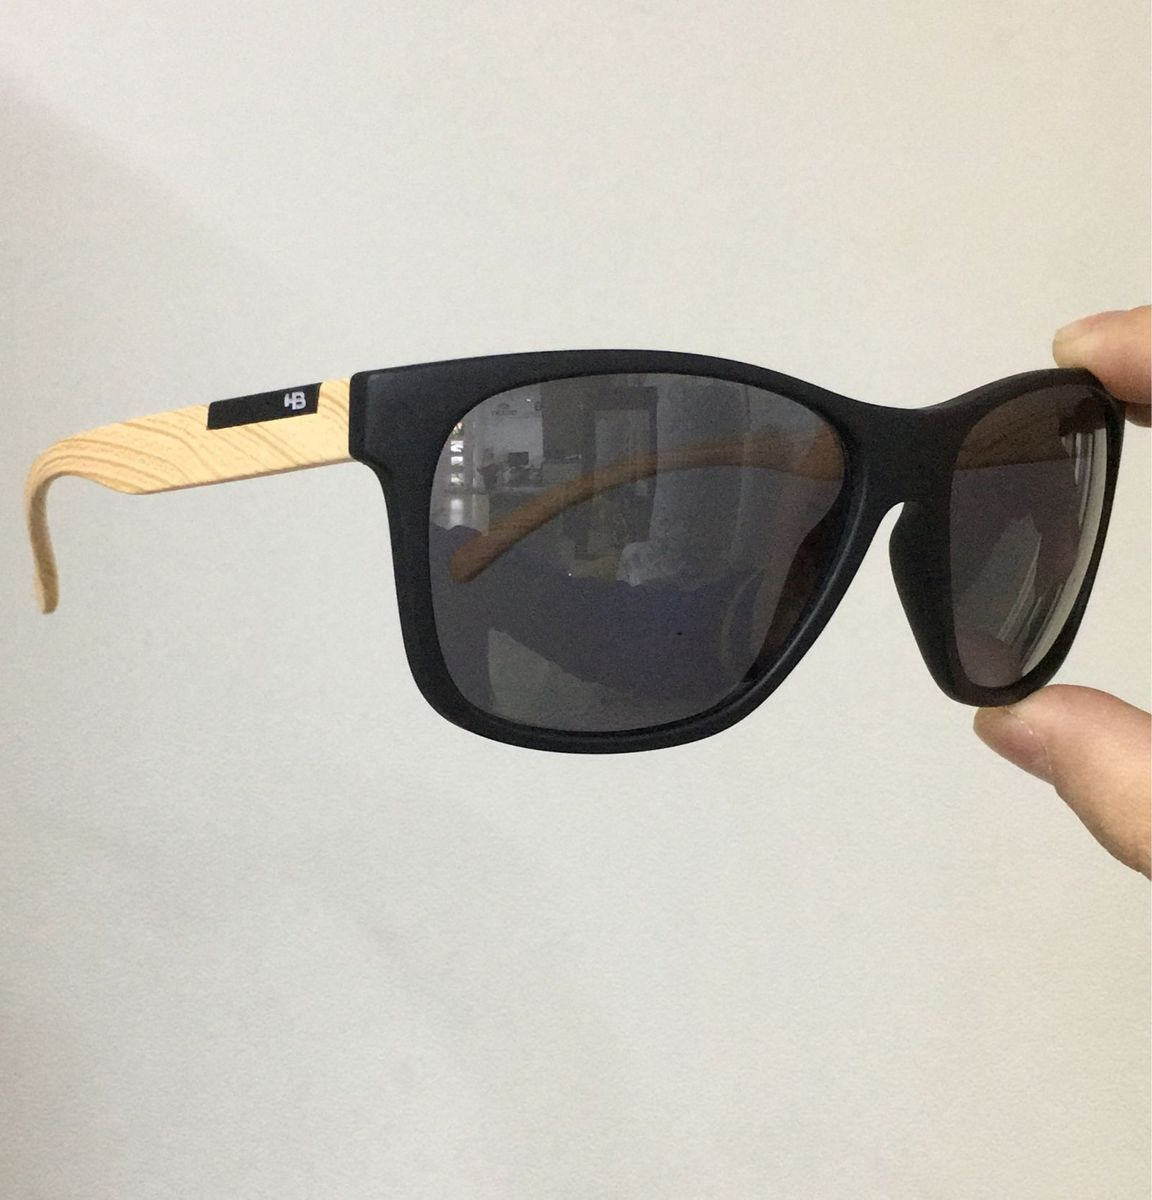 Óculos Hb com Haste Diferente   Óculos Masculino Hot Buttered Hb ... d3d5221d6d